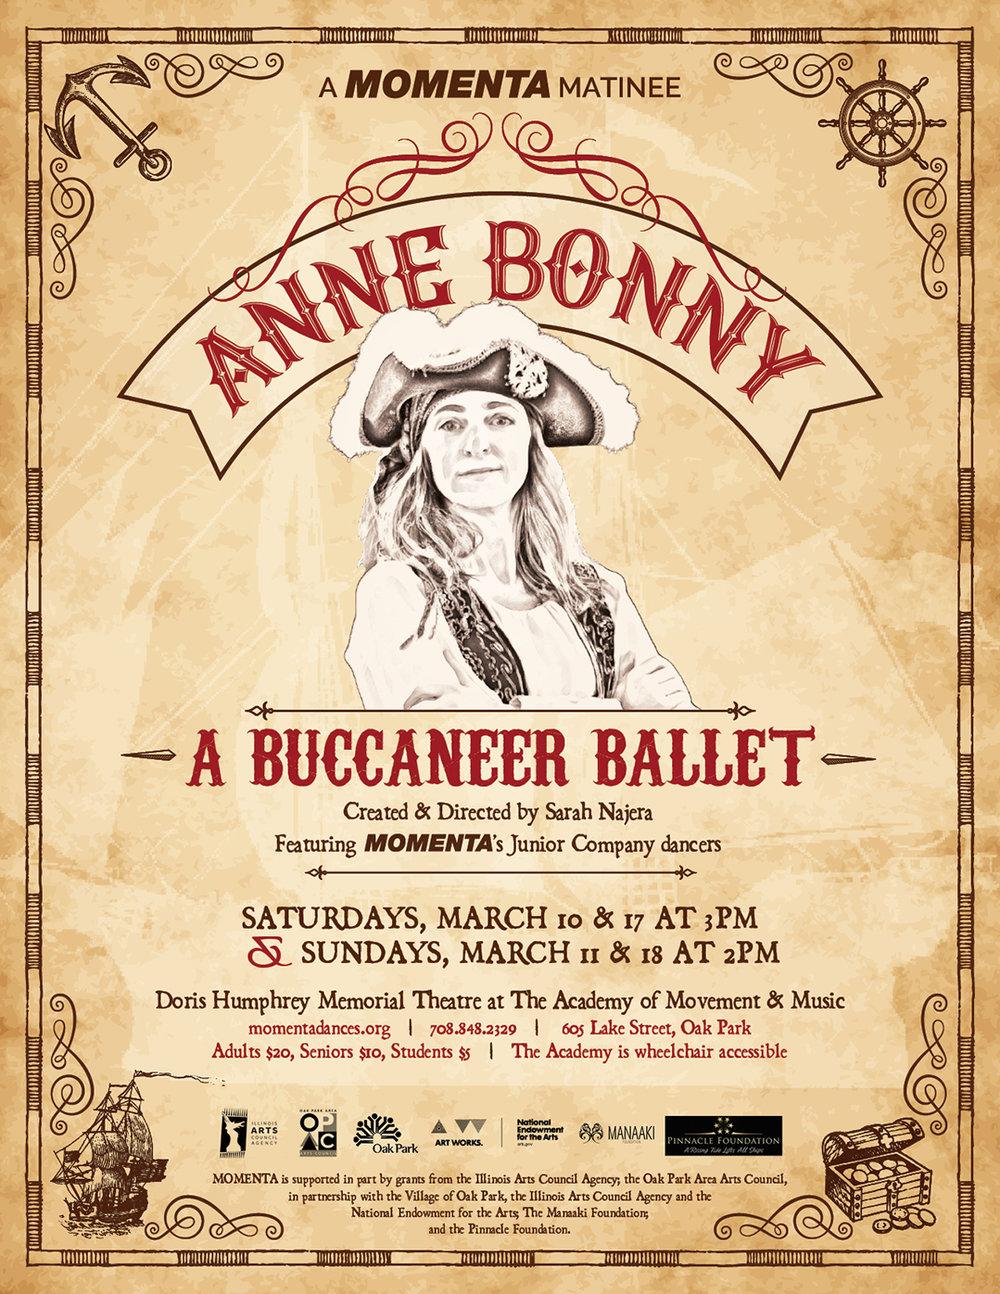 Anne Bonny: A Buccaneer Ballet